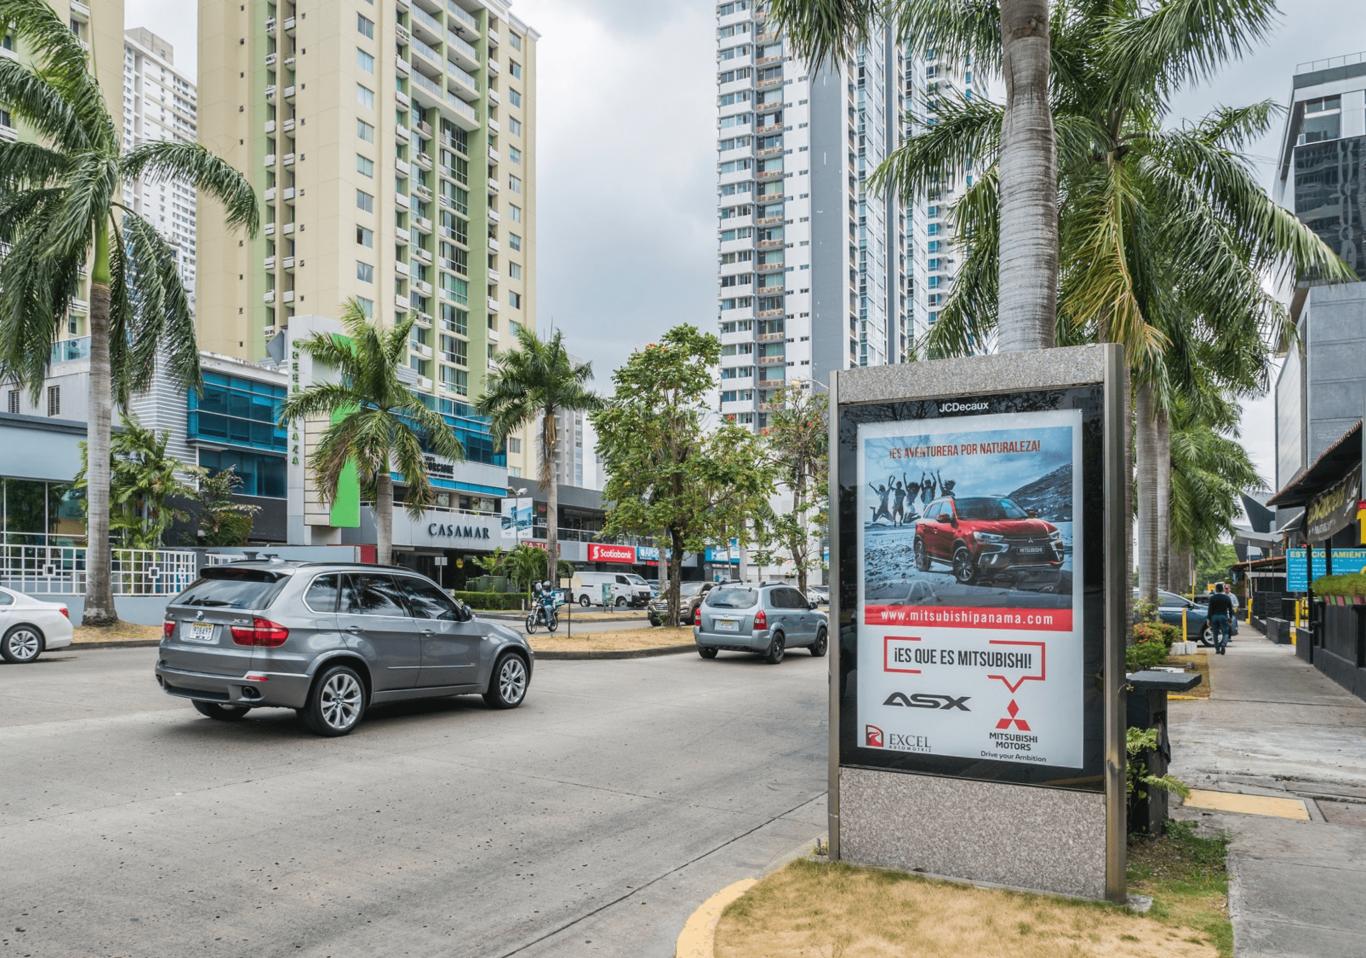 Mupis publicitarios panamá - Mobiliario Urbano - JCDecaux Top Media